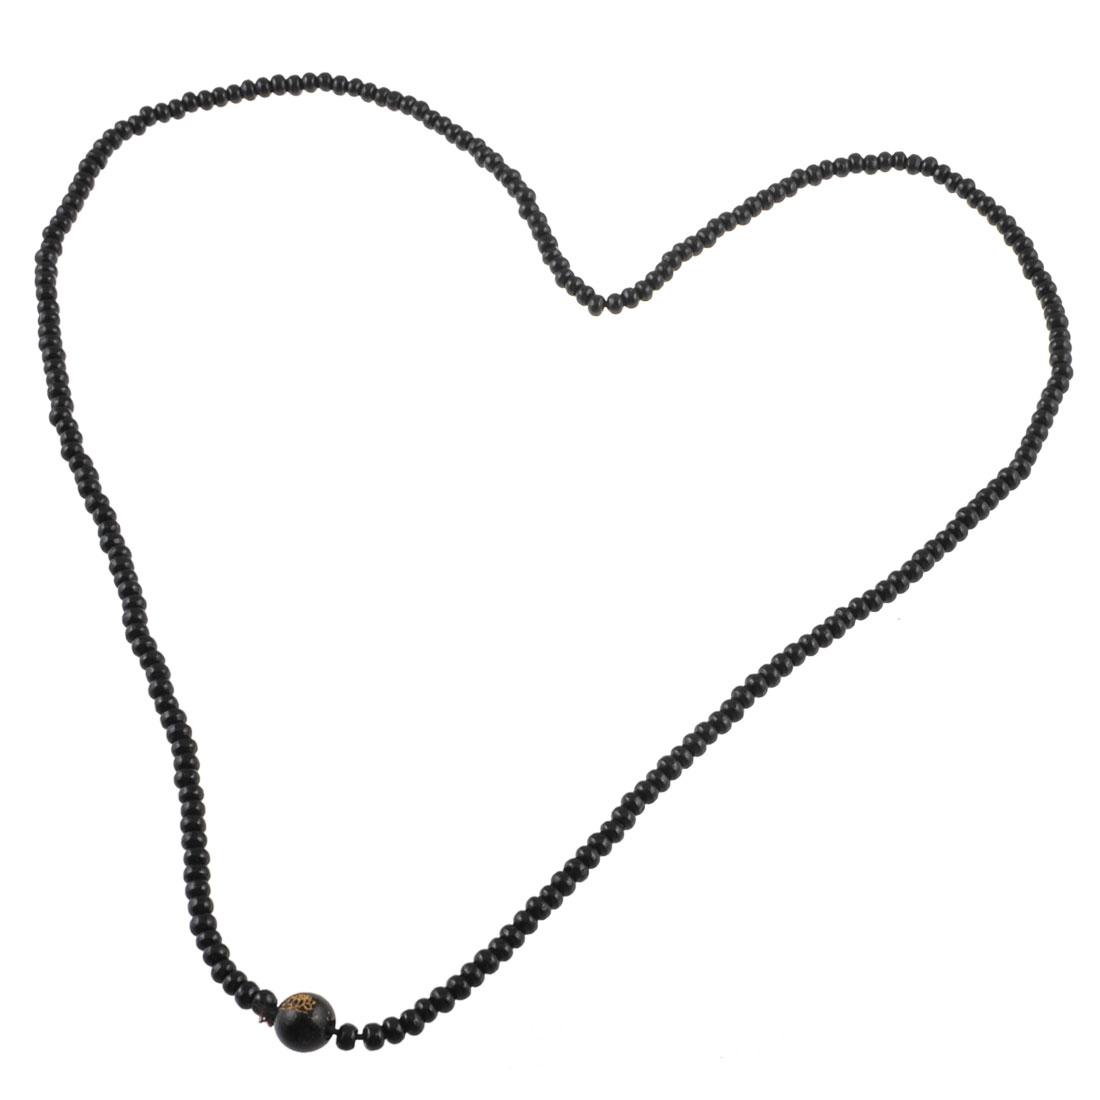 Unisex Wooden 216 Bead Buddhist Prayer Buddha Necklace Black 23.6 Inch Girth